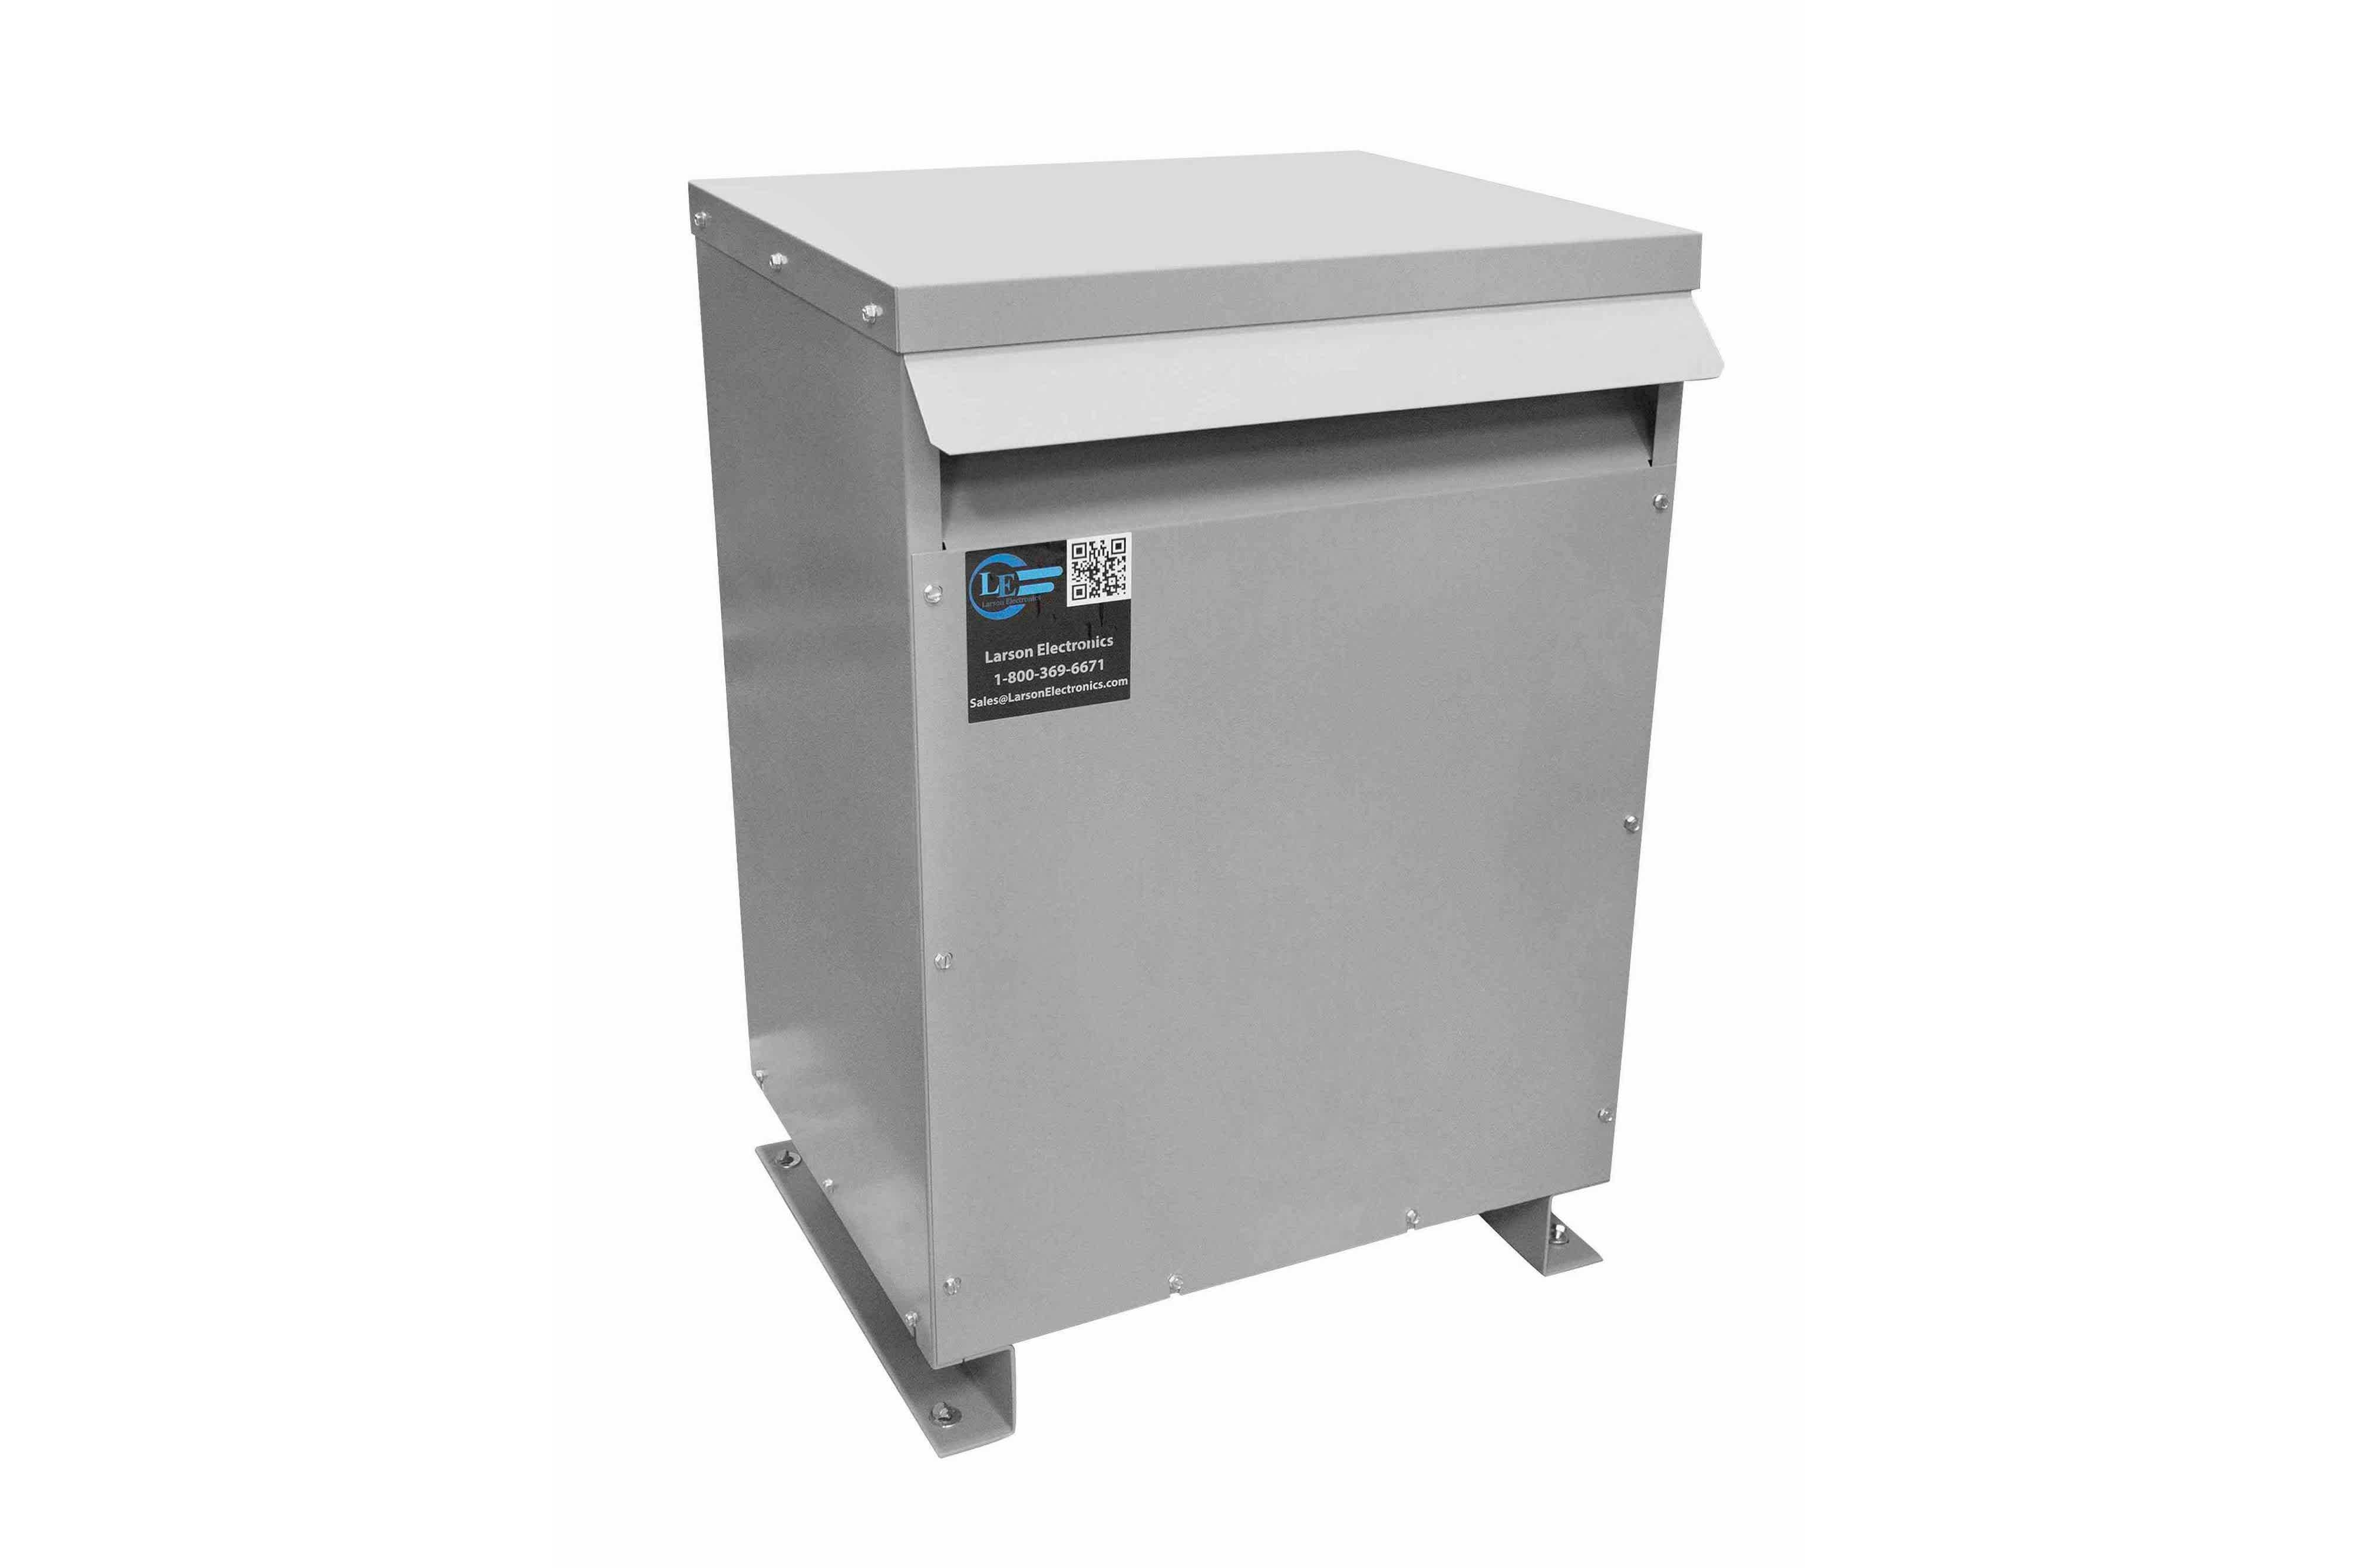 700 kVA 3PH Isolation Transformer, 575V Wye Primary, 415V Delta Secondary, N3R, Ventilated, 60 Hz